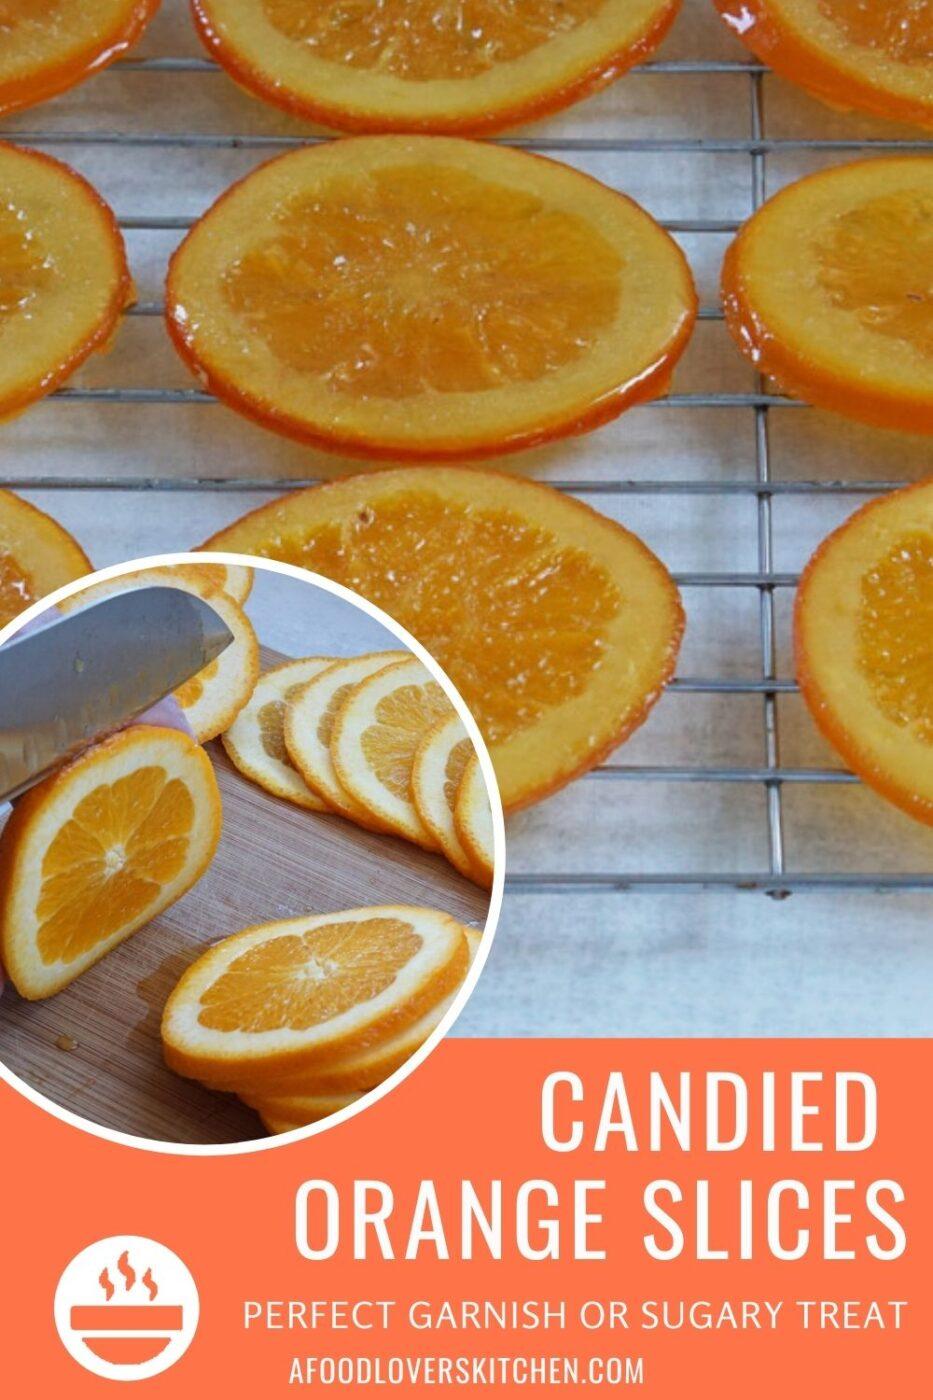 Fresh orange slices and candied oranges